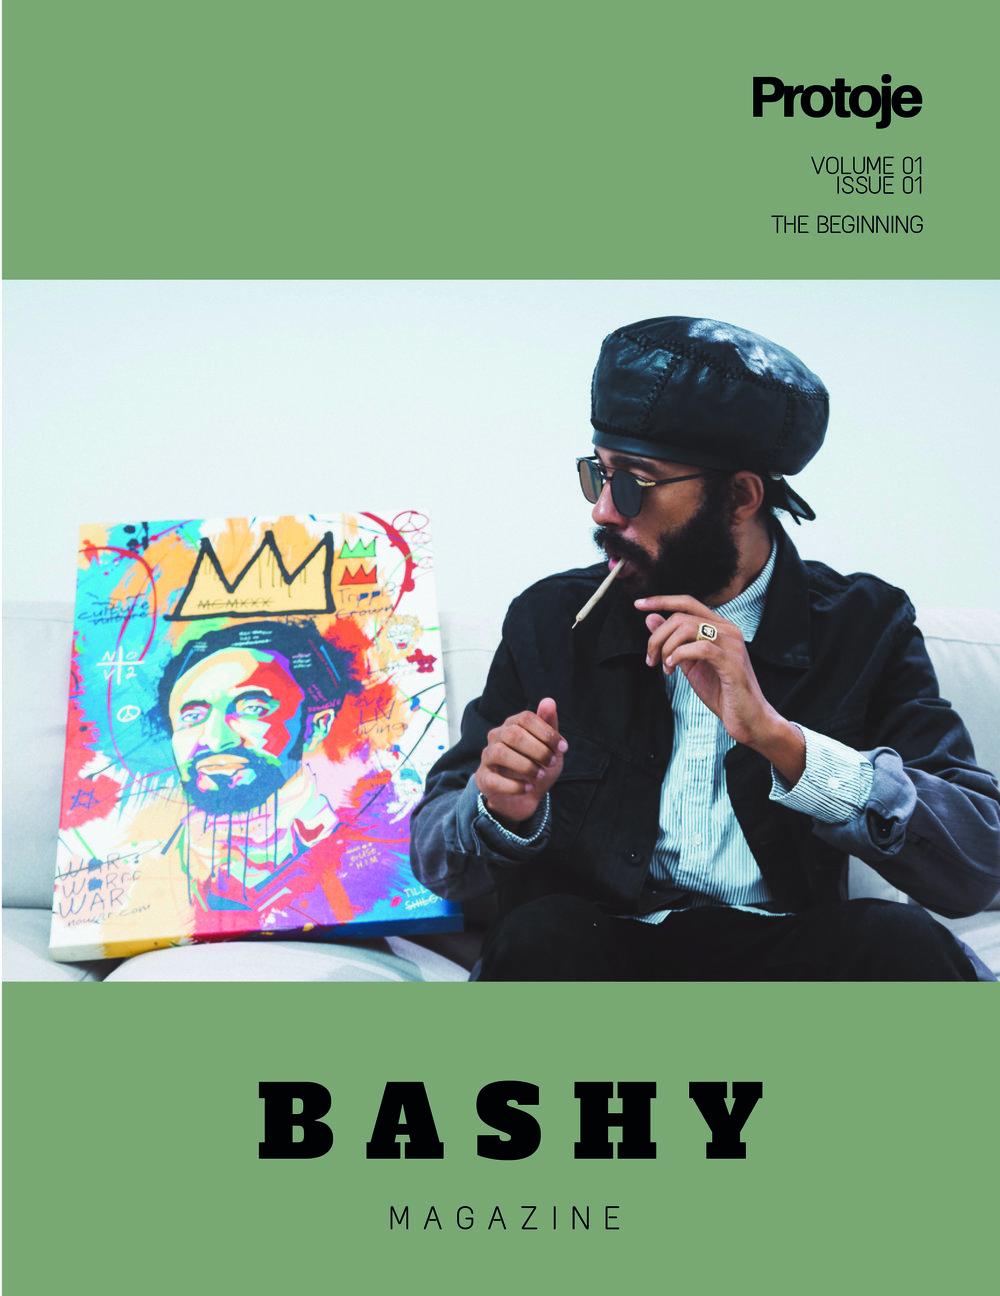 BASHY v1i1 cover (1).jpg